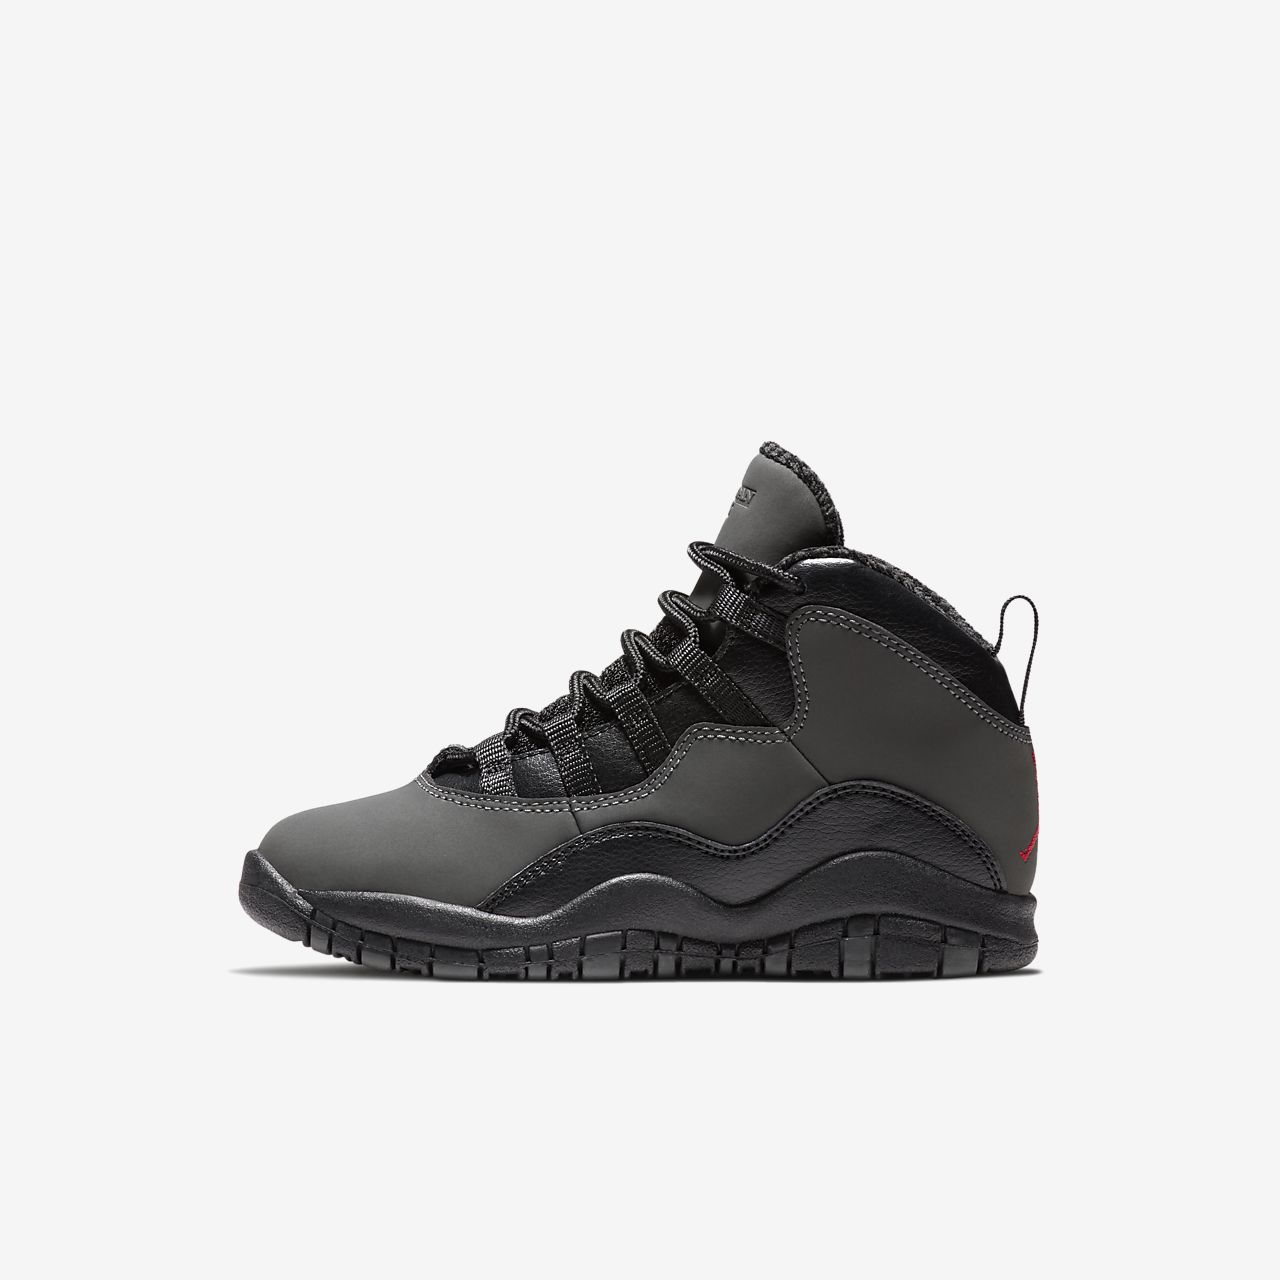 jordan shoes 3y